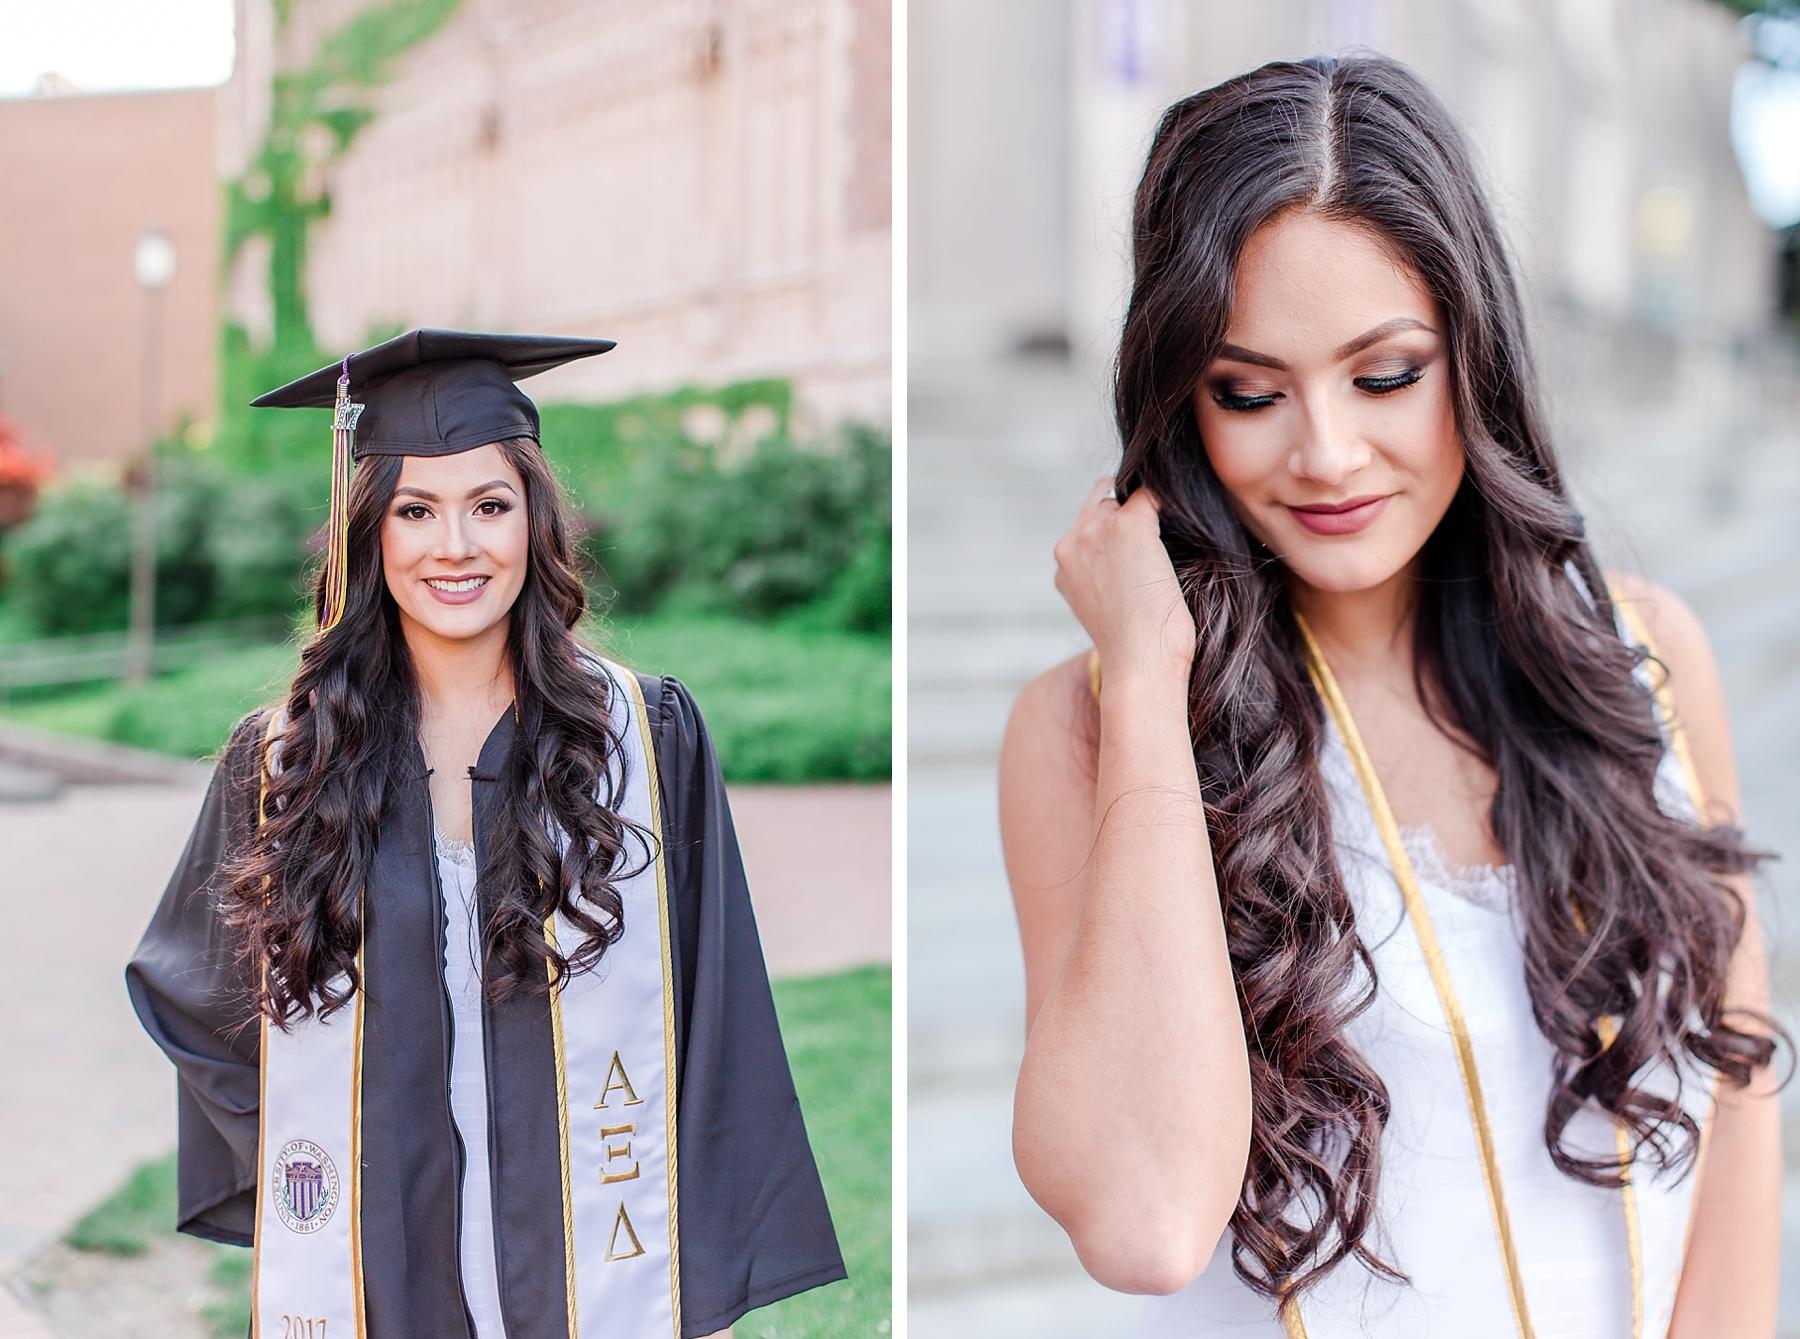 university-of-washington-seattle-senior-graduation-photos_0349.jpg